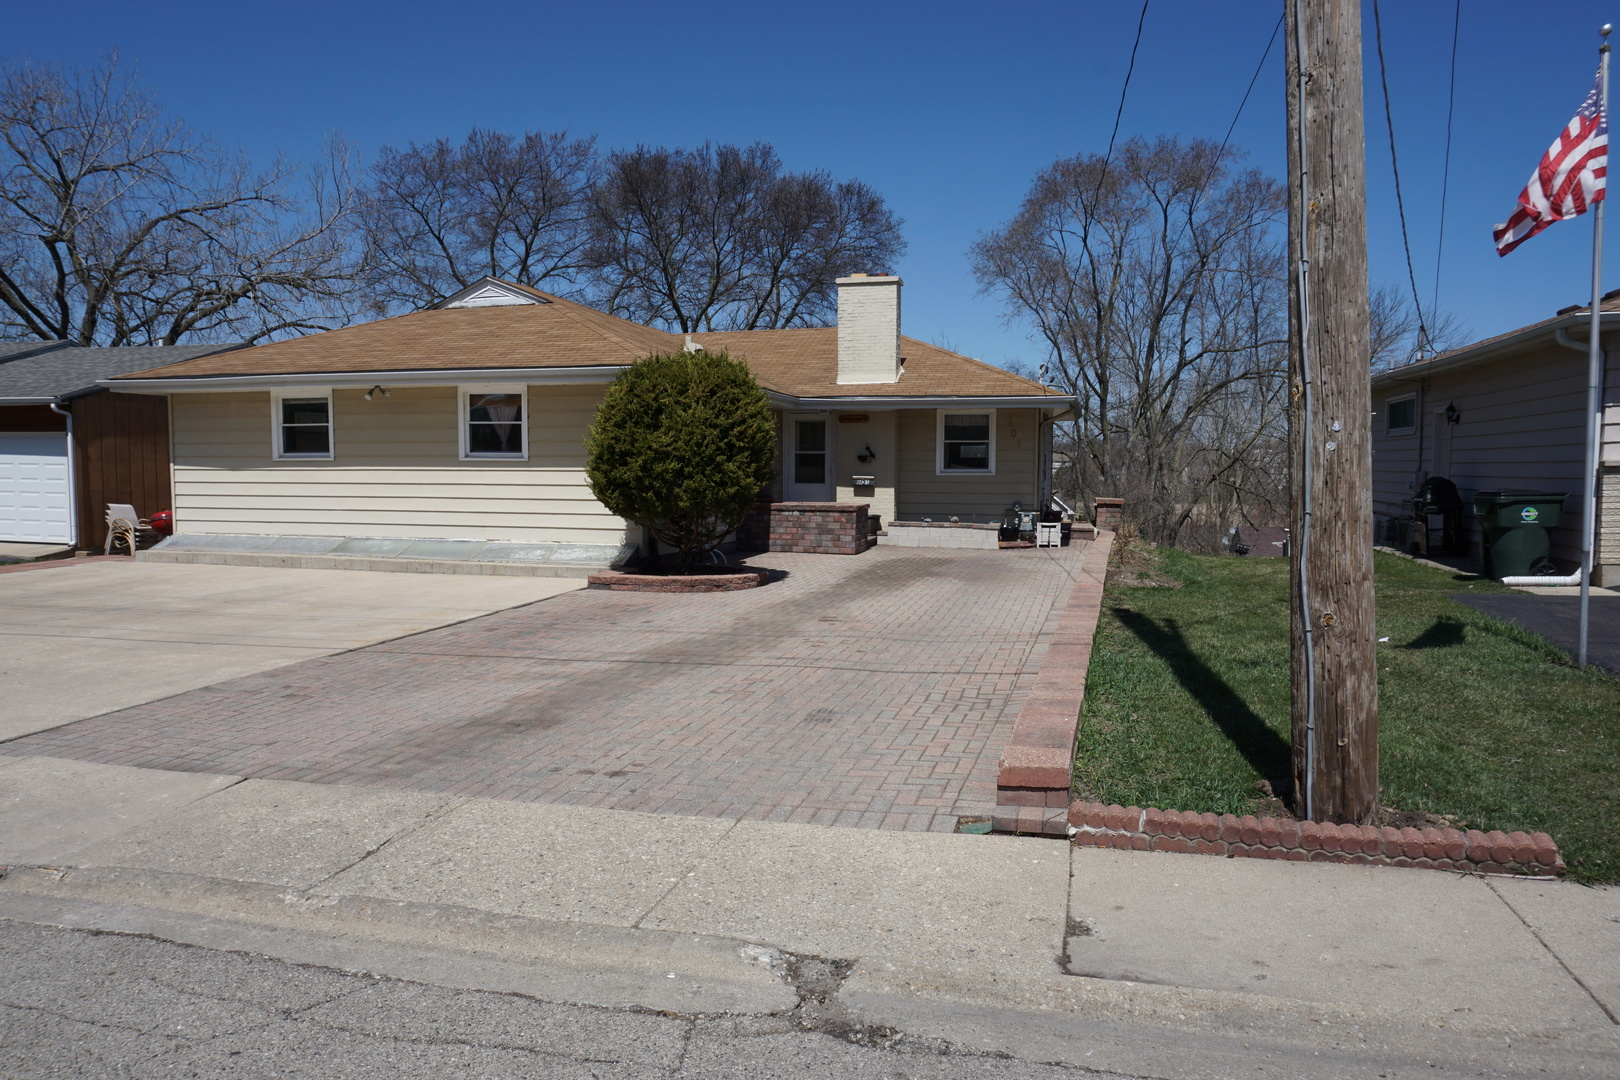 601 ORCHARD STREET, ANTIOCH, IL 60002